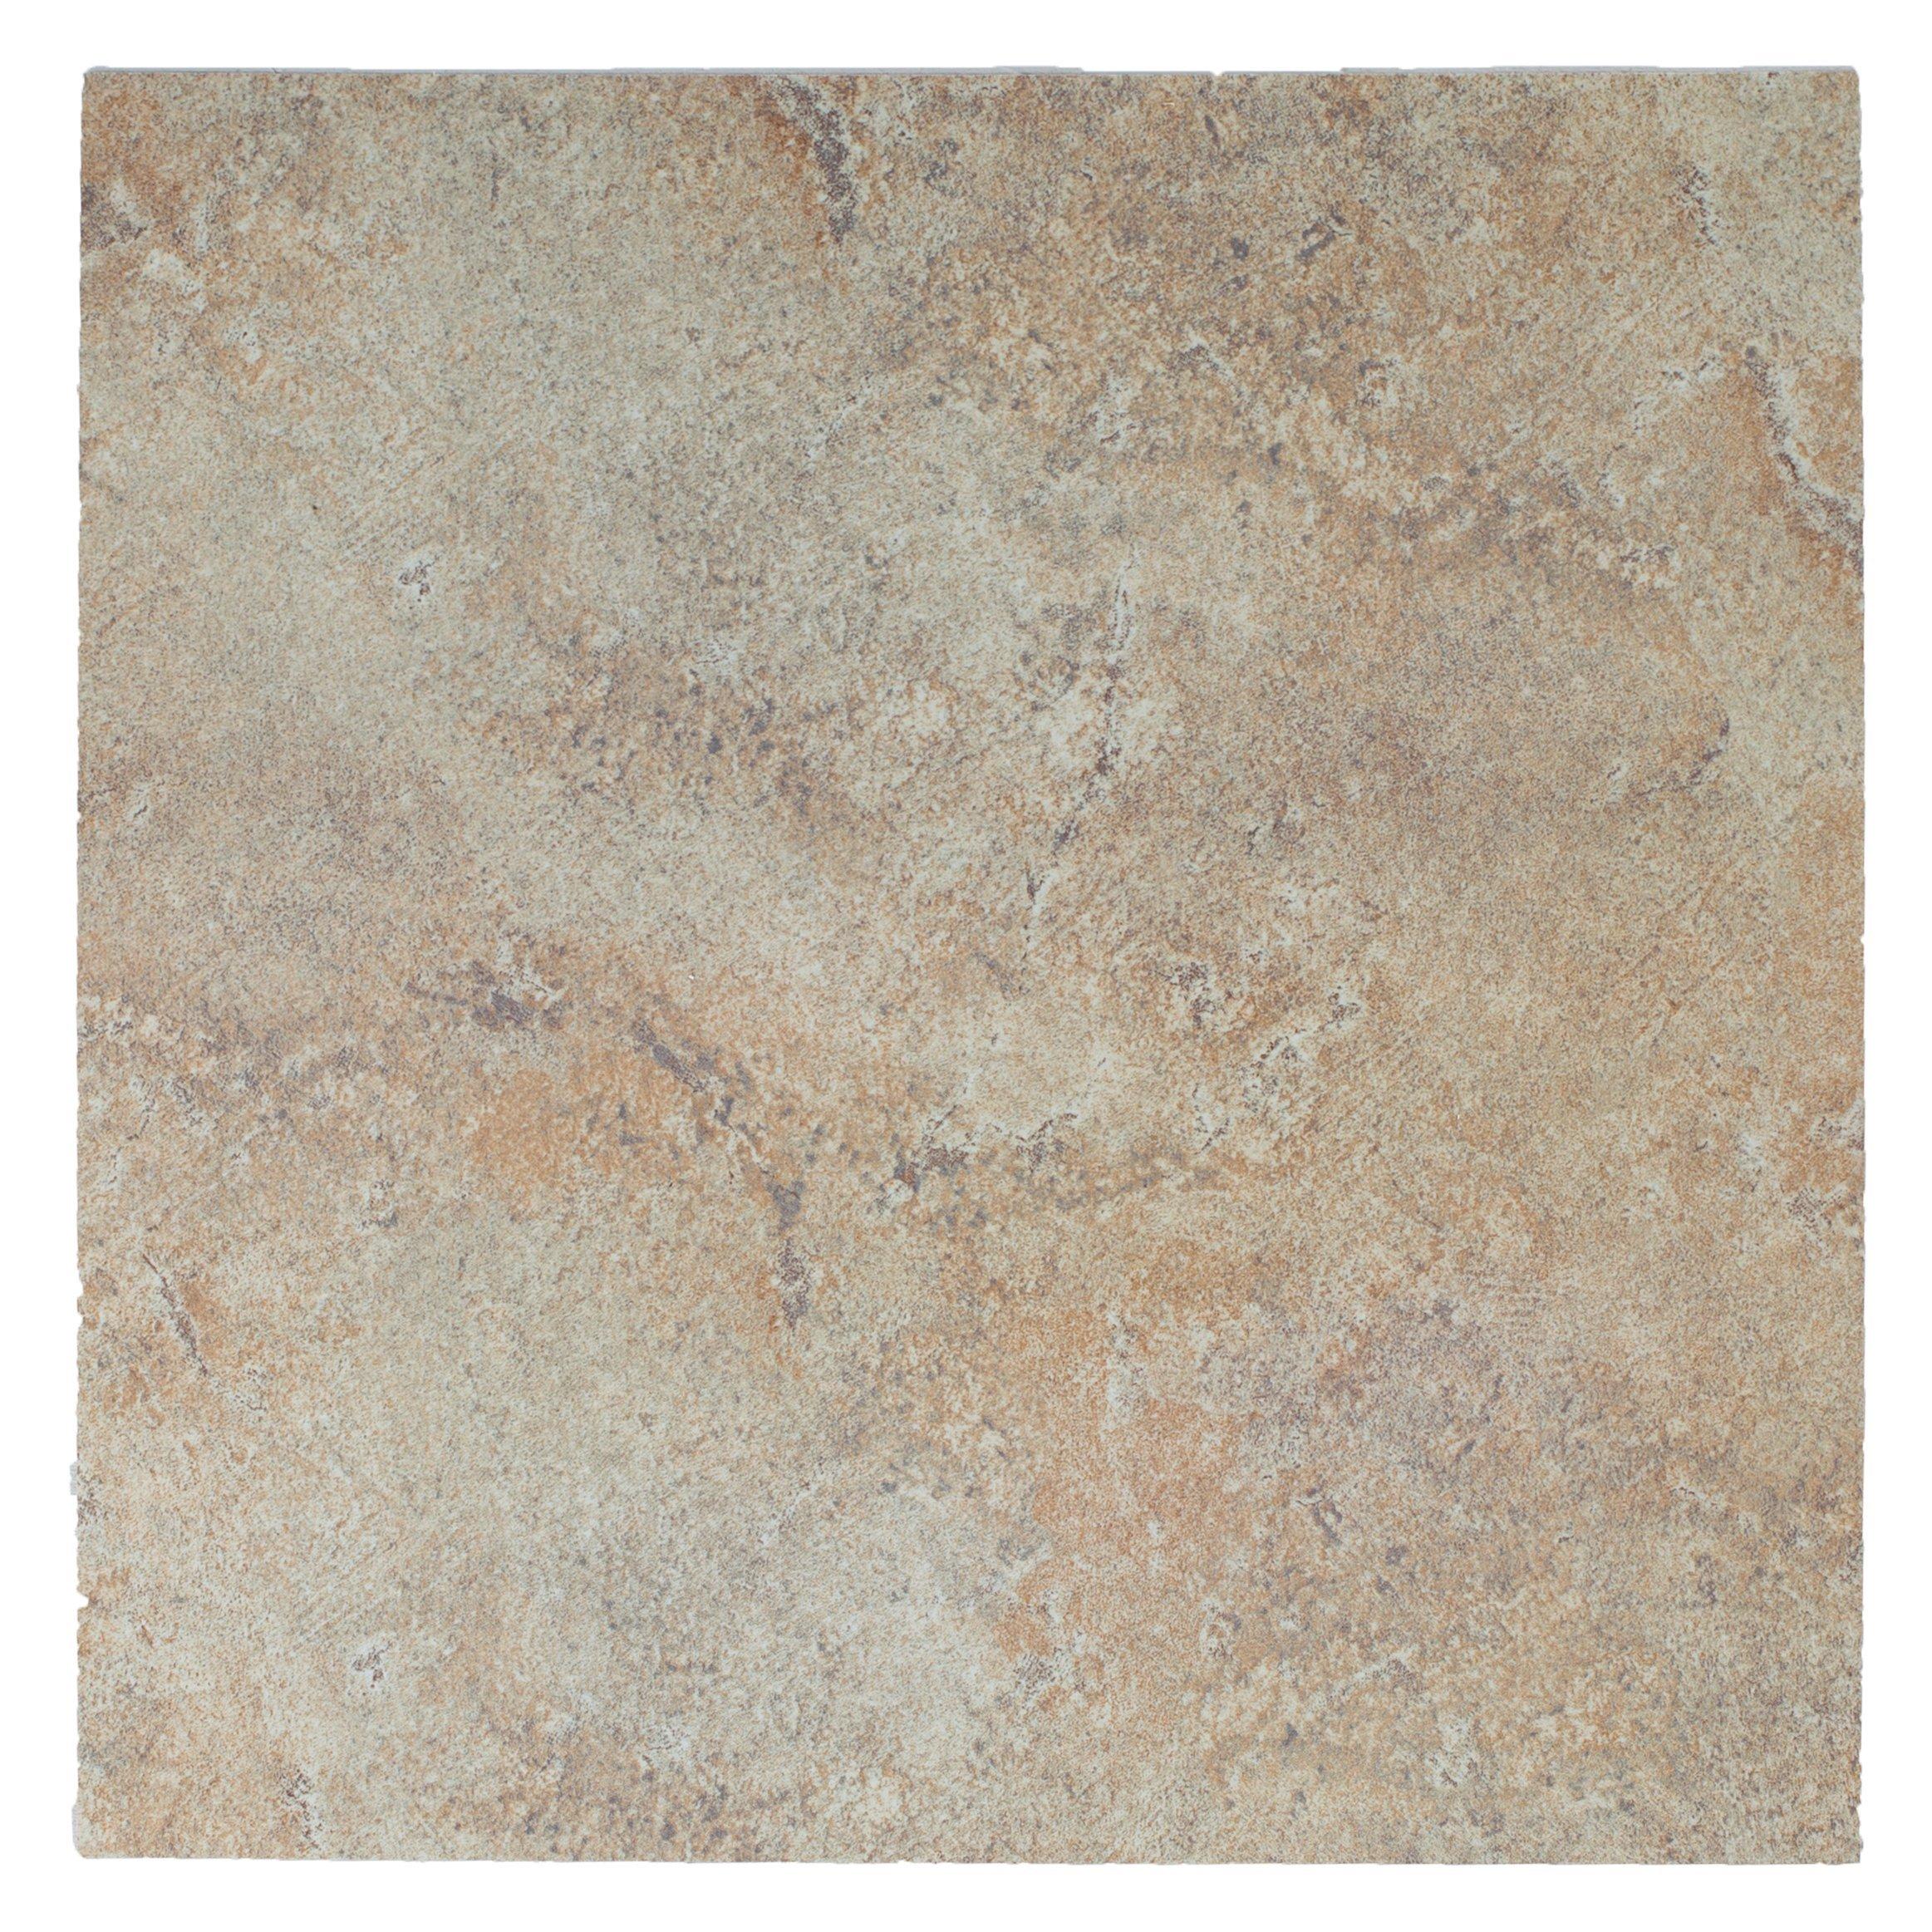 Cortina Cafe Slate Vinyl Tile 1mm 100129535 Floor And Decor